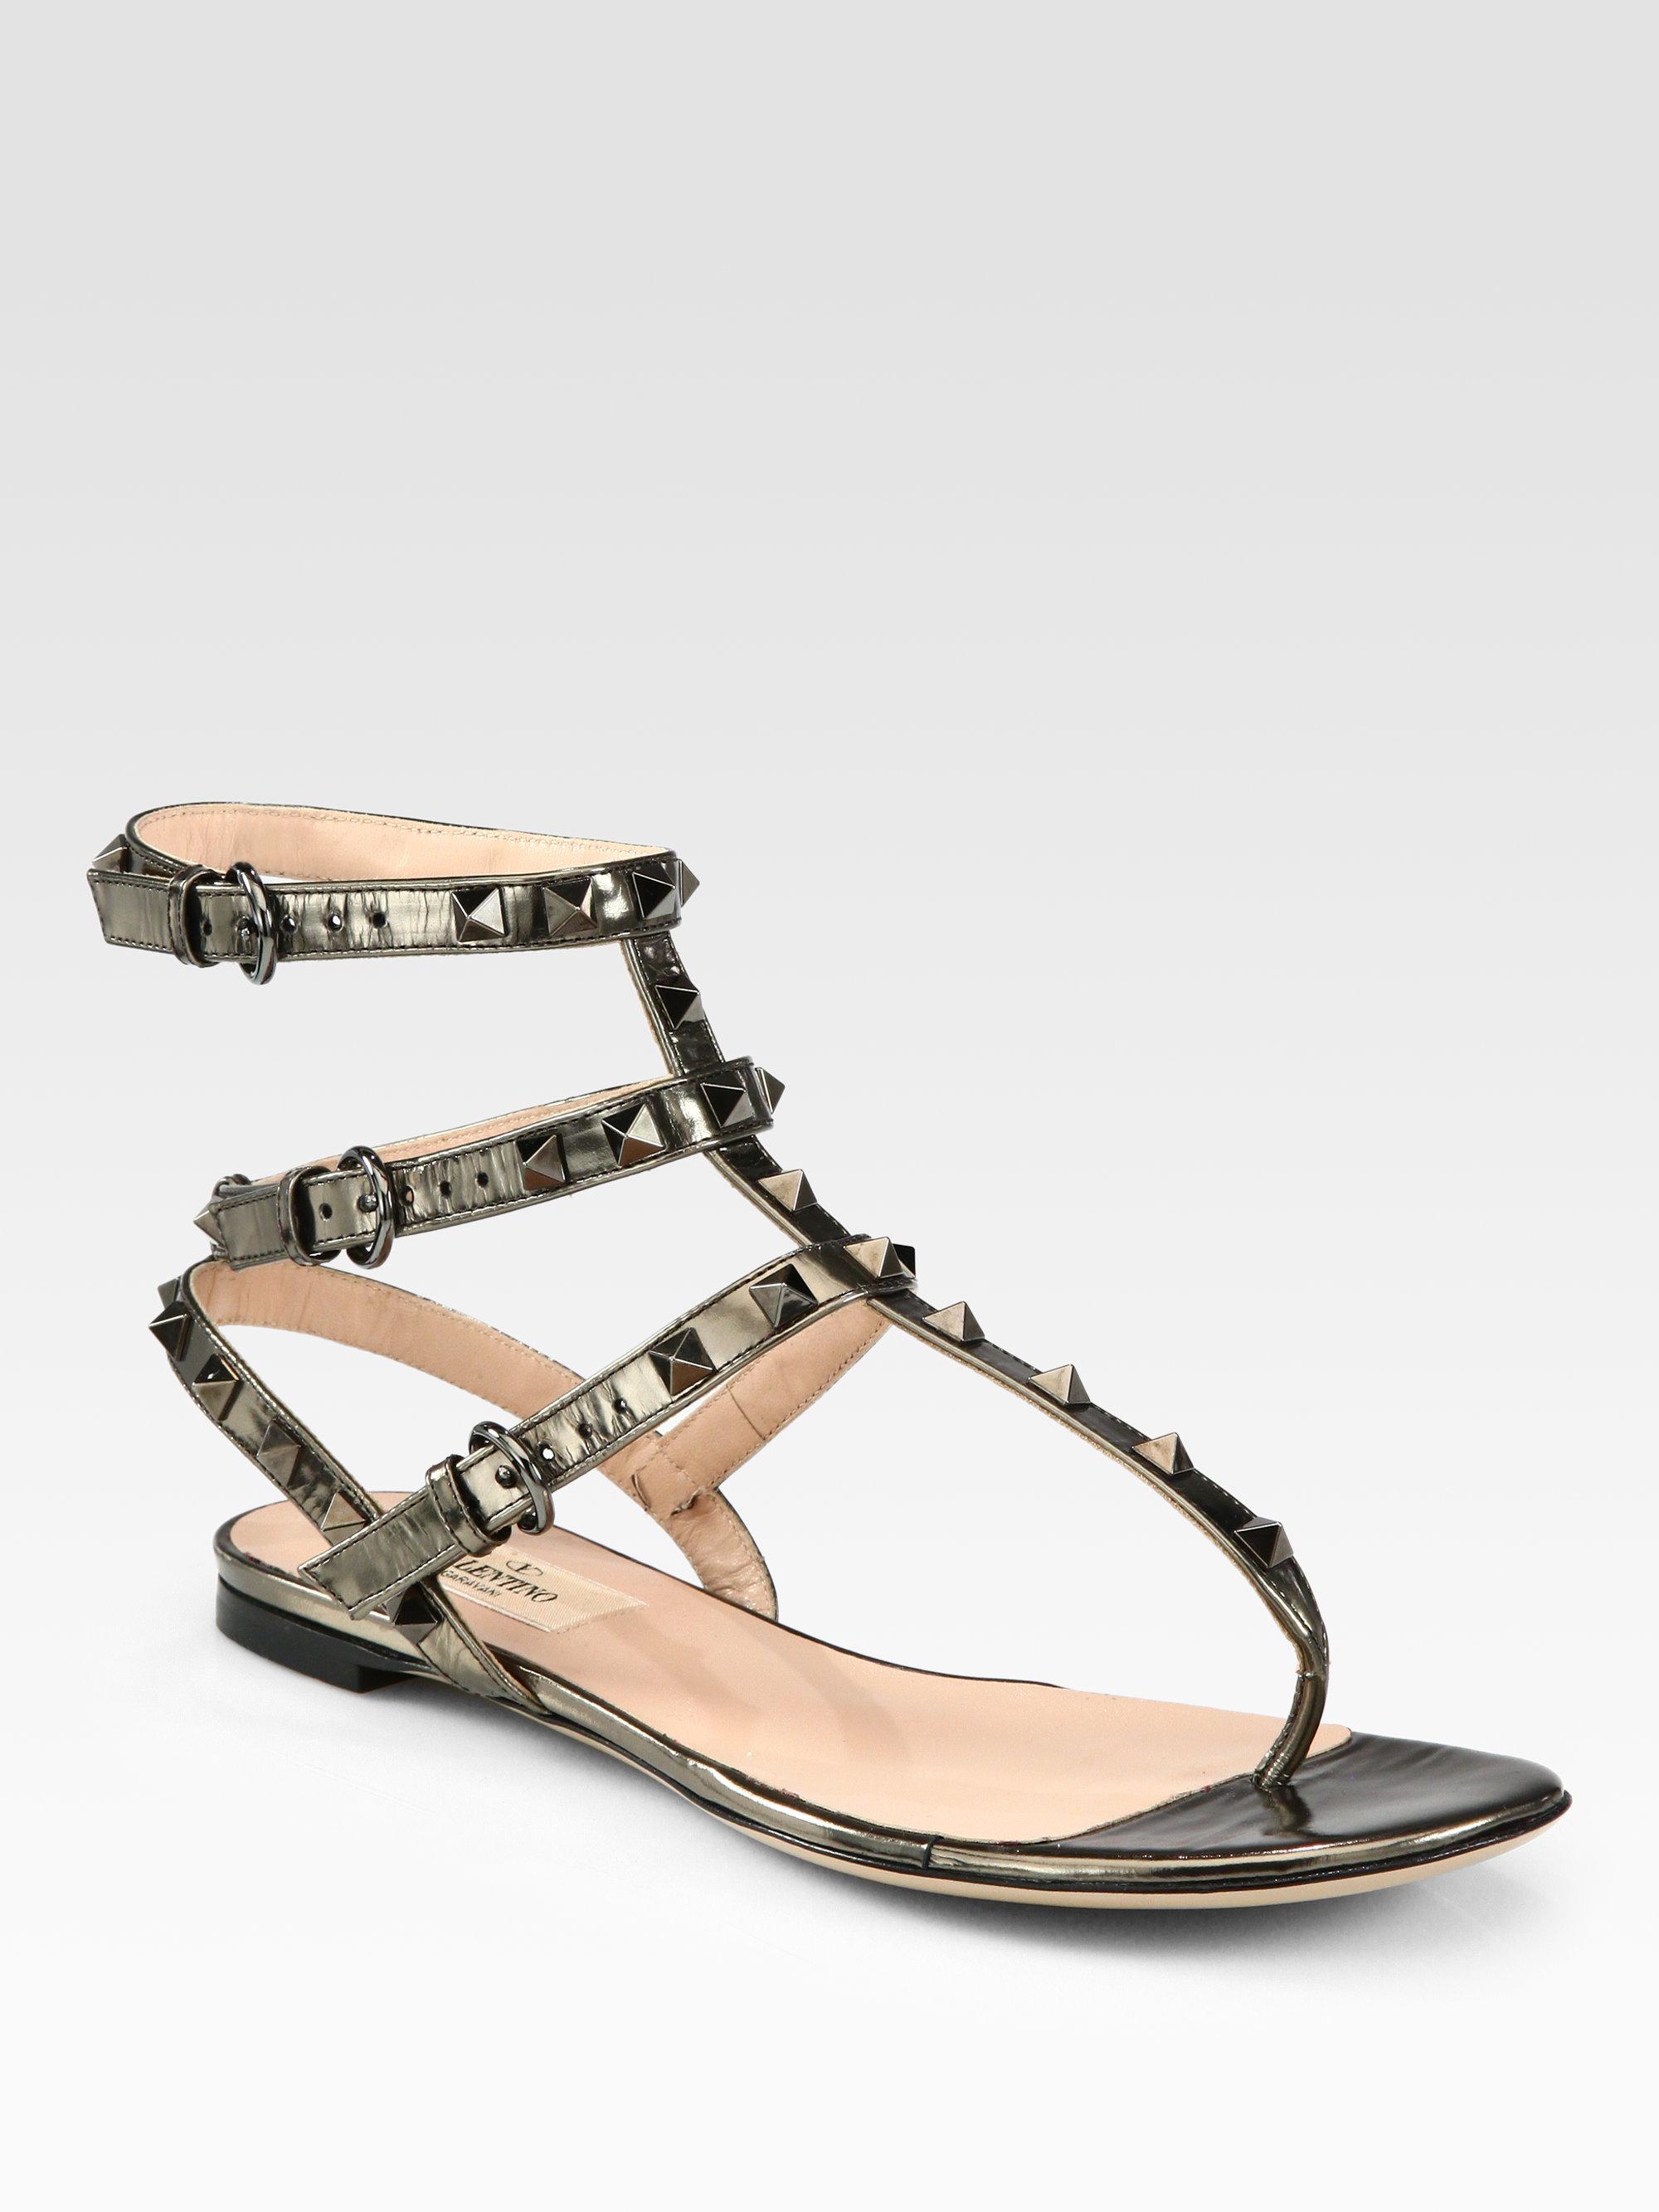 Valentino Rockstud Gladiator Metallic Leather Thong